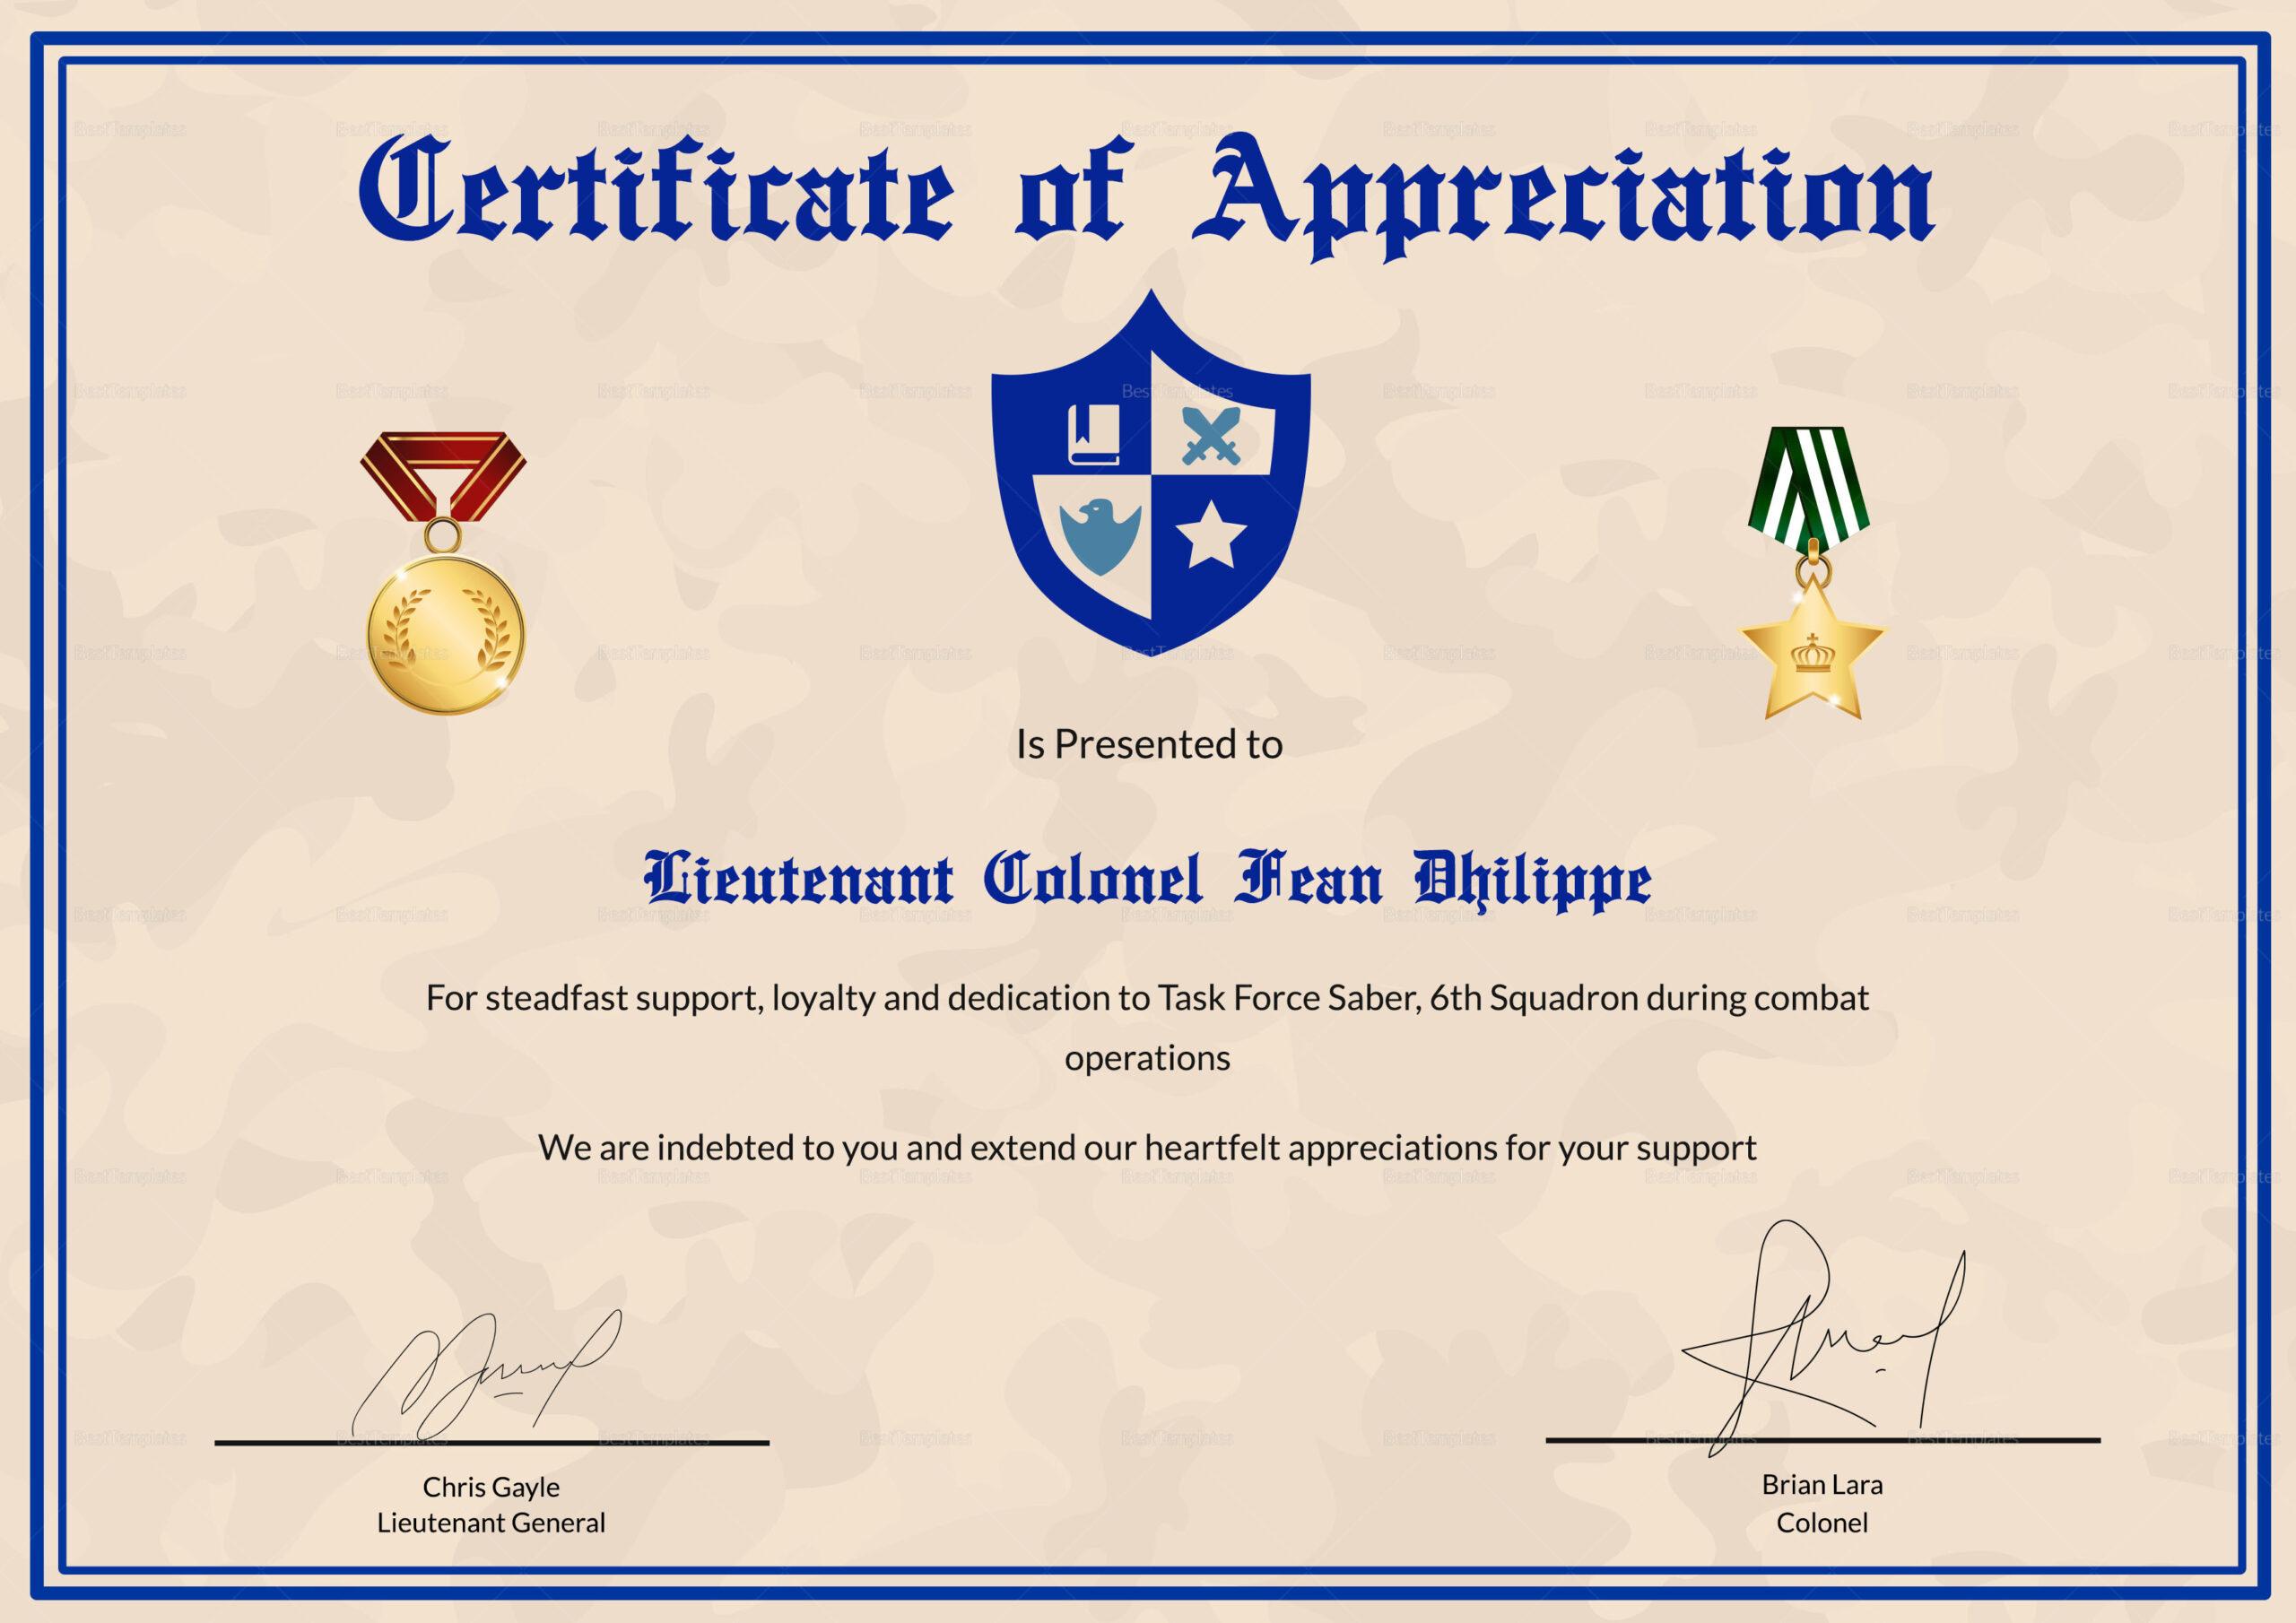 Army Certificate Of Appreciation Template  Best Business within Army Certificate Of Appreciation Template